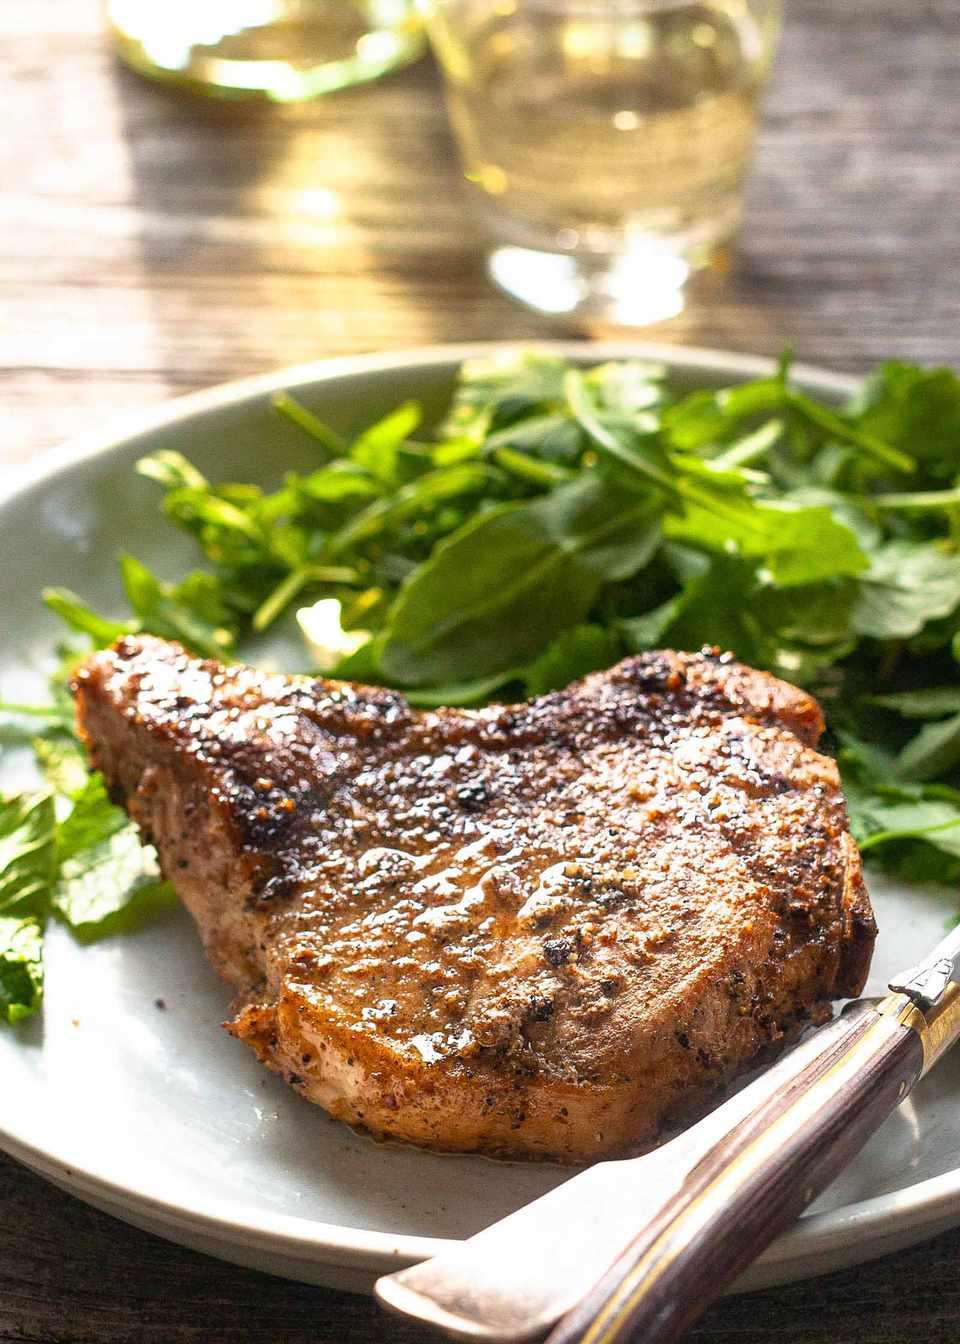 Easy Pork Chop Recipe pork chop on plate with greens